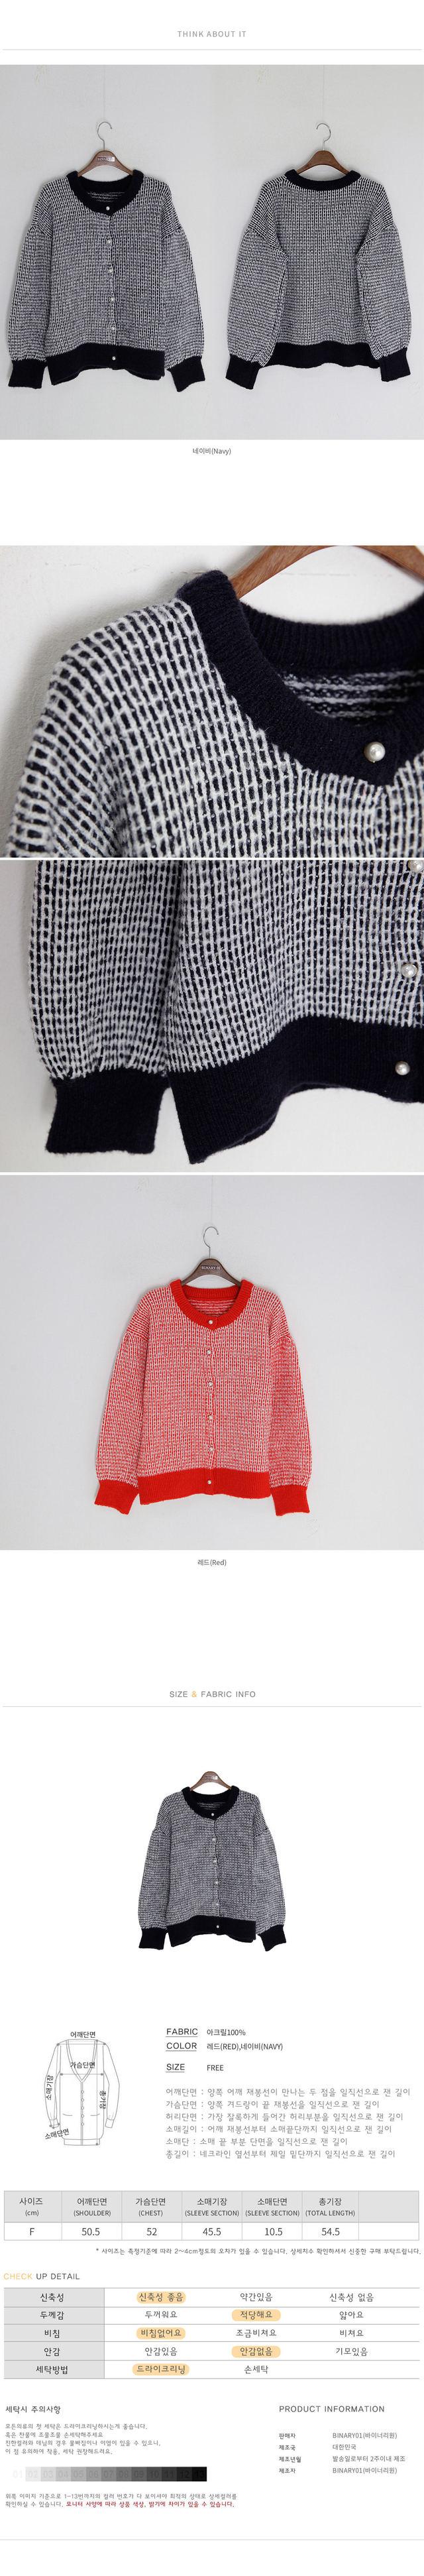 Check modern knit cardigan